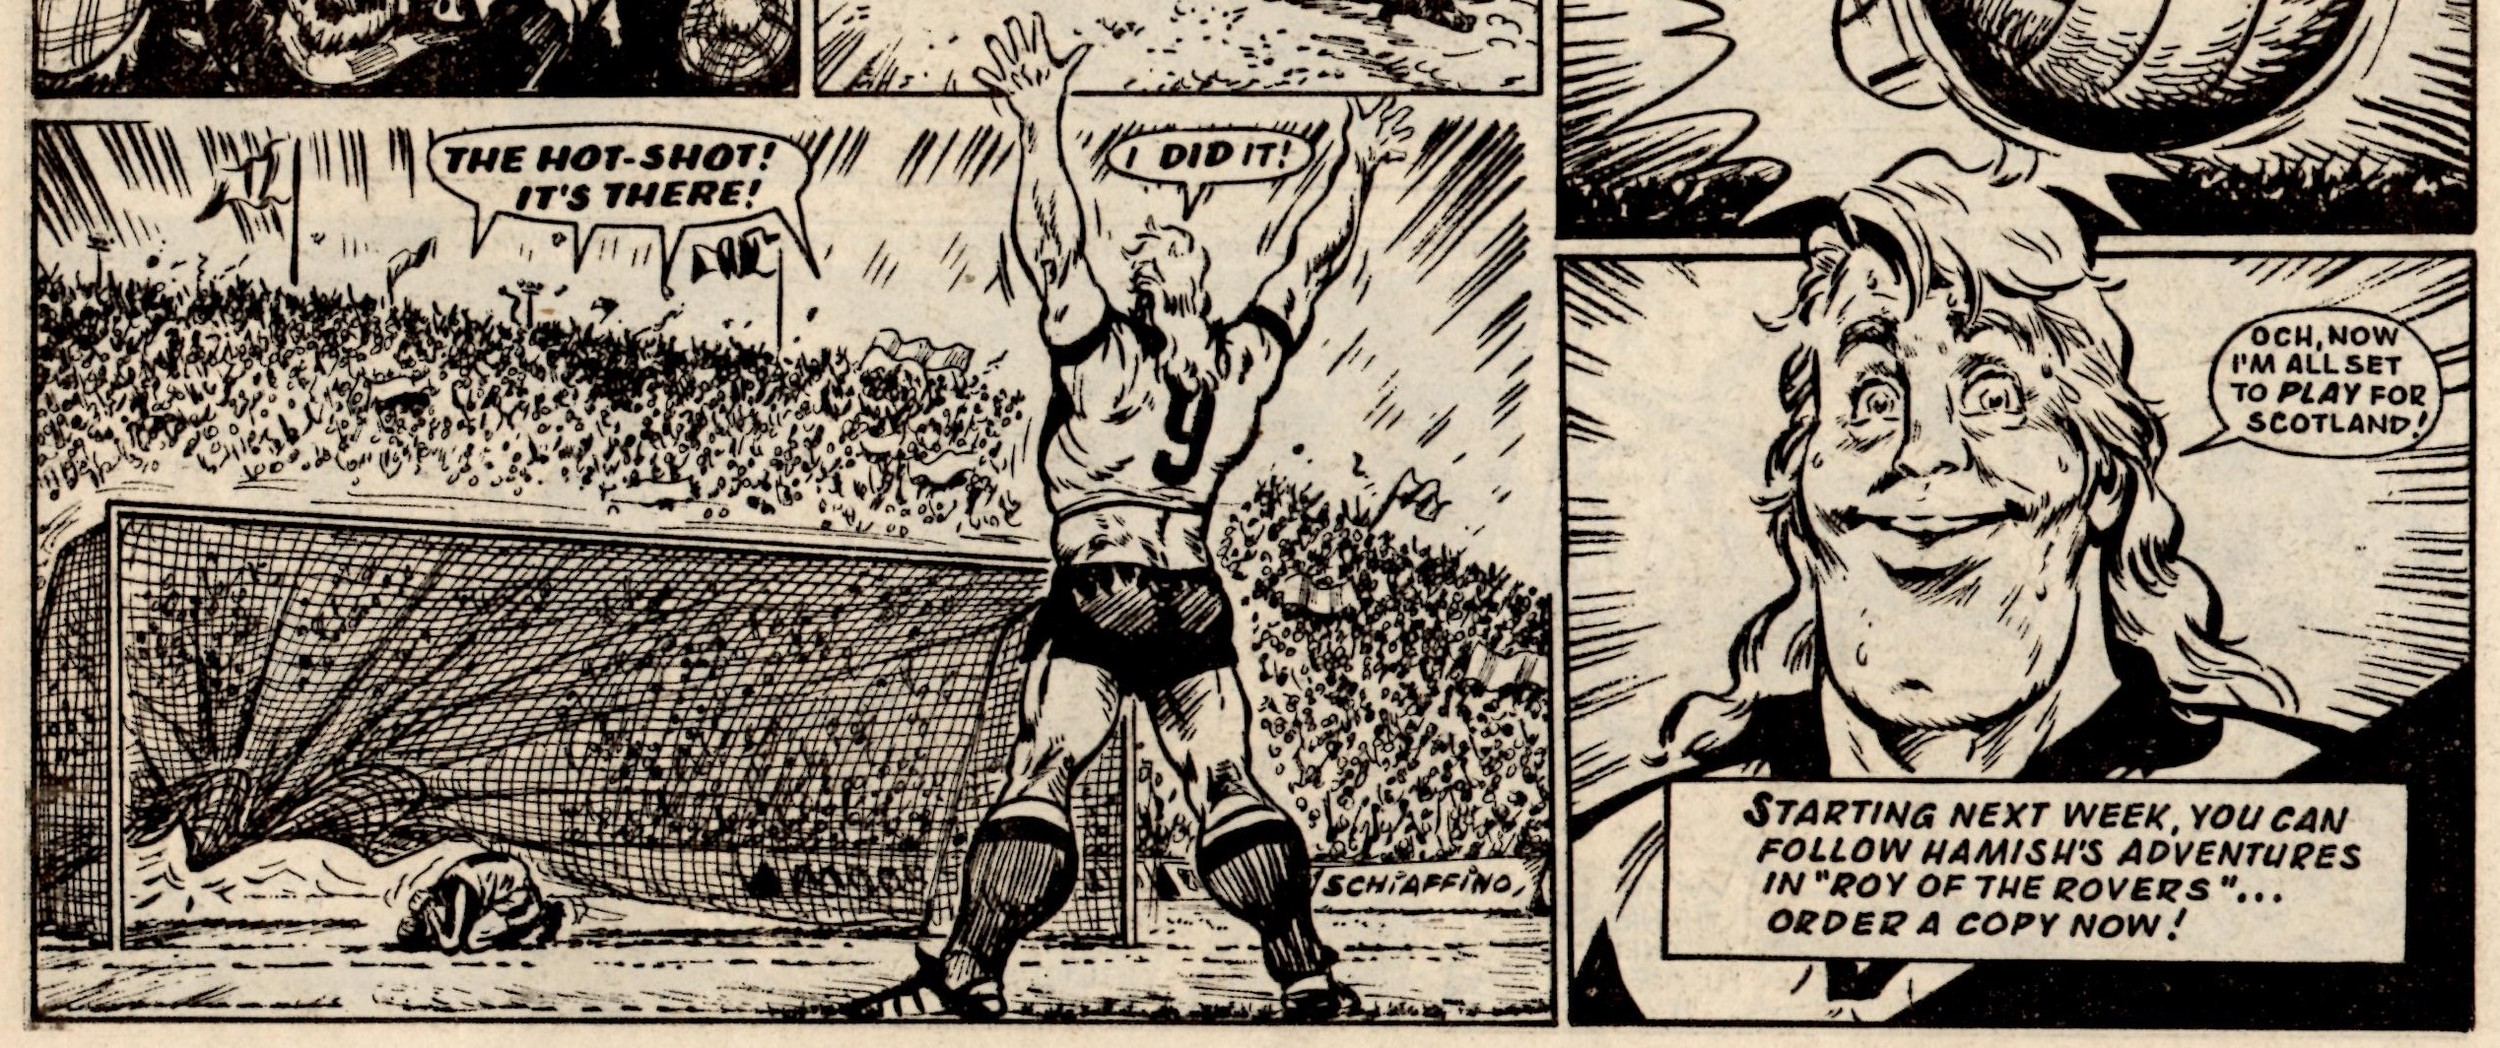 Hot-shot Hamish: Fred Baker (writer), Julio Schiaffino (artist)